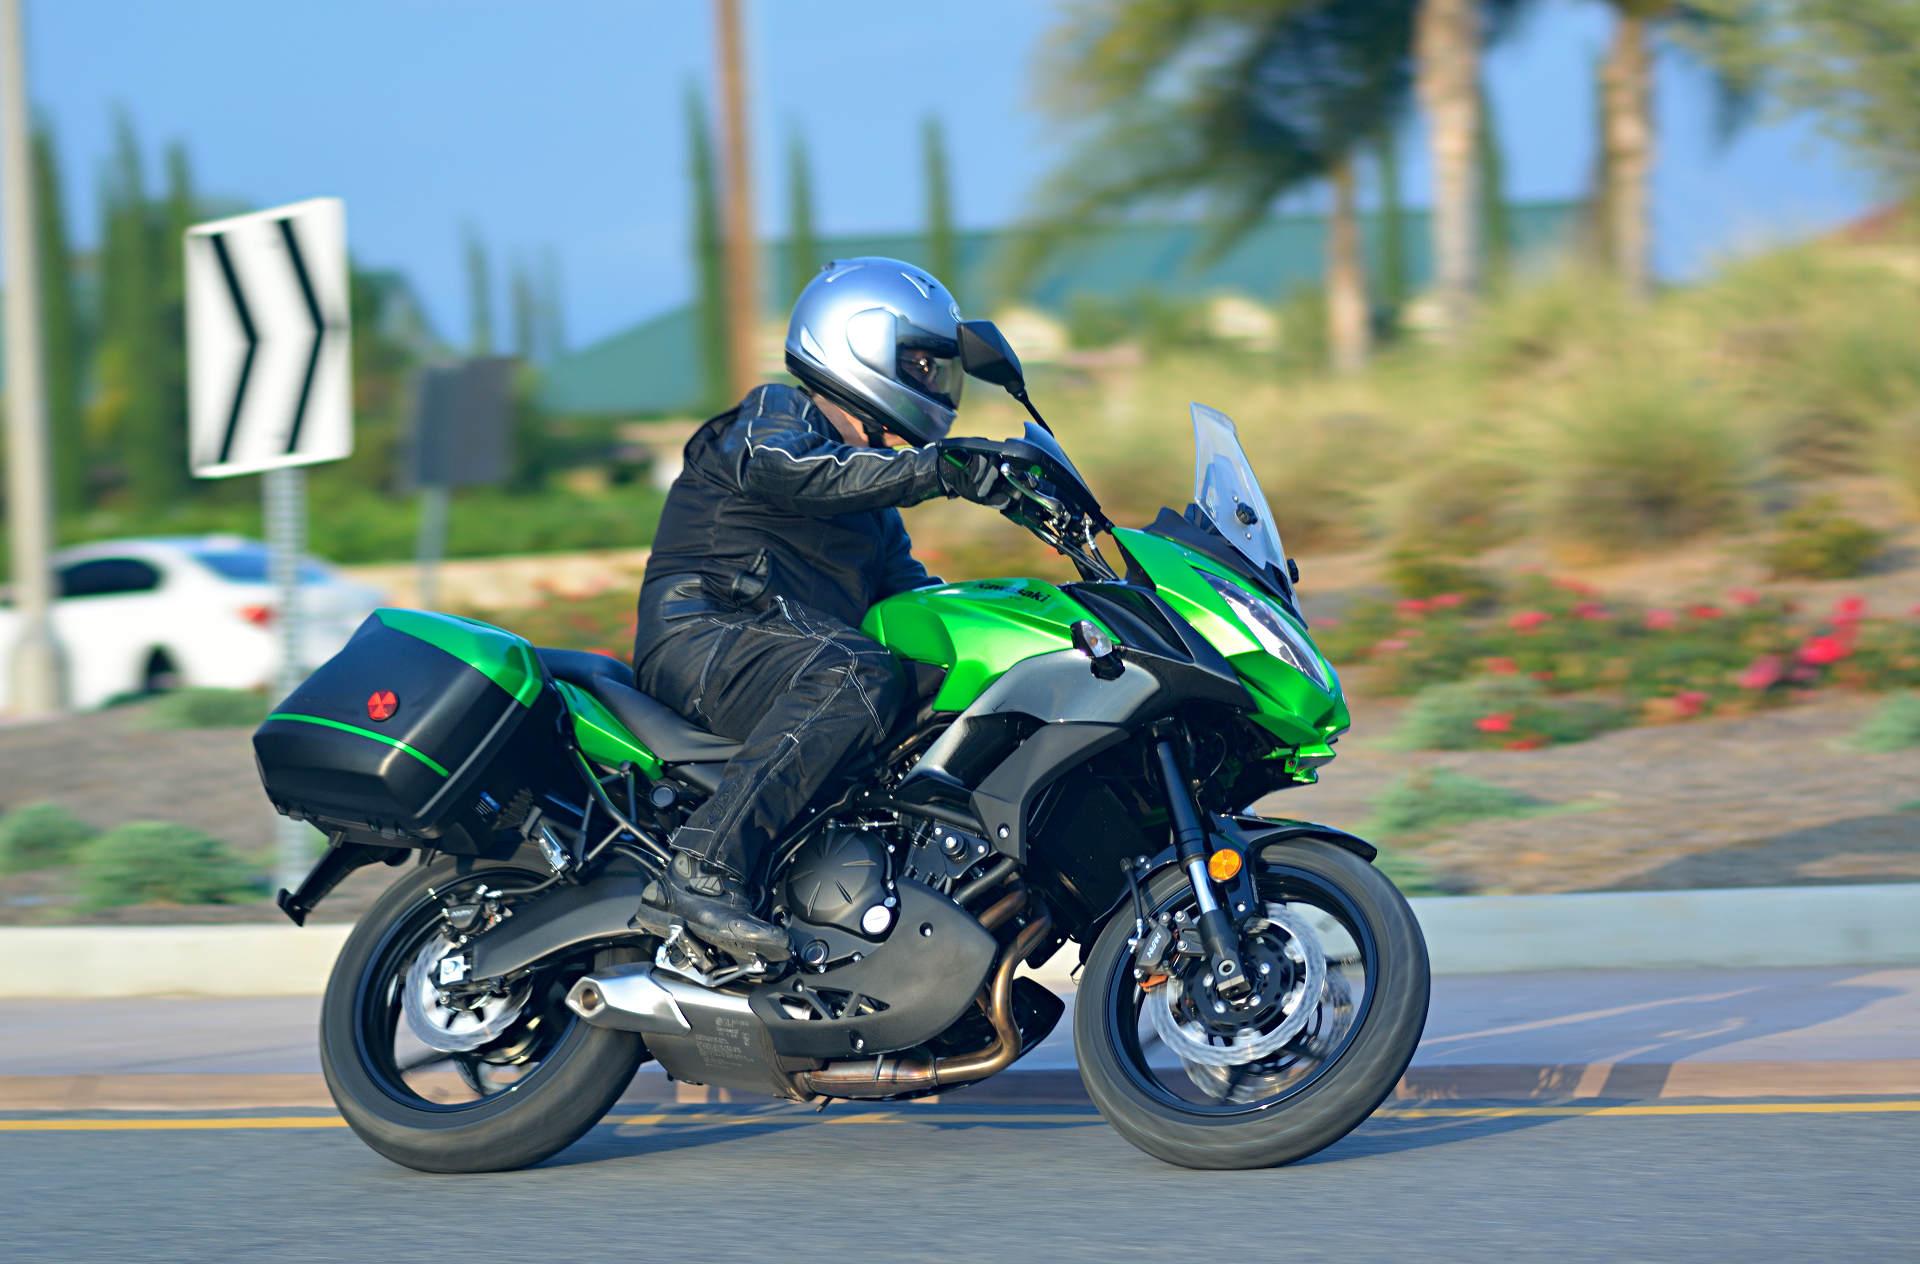 Any Motorcycle Better Than The Kawasaki Versys